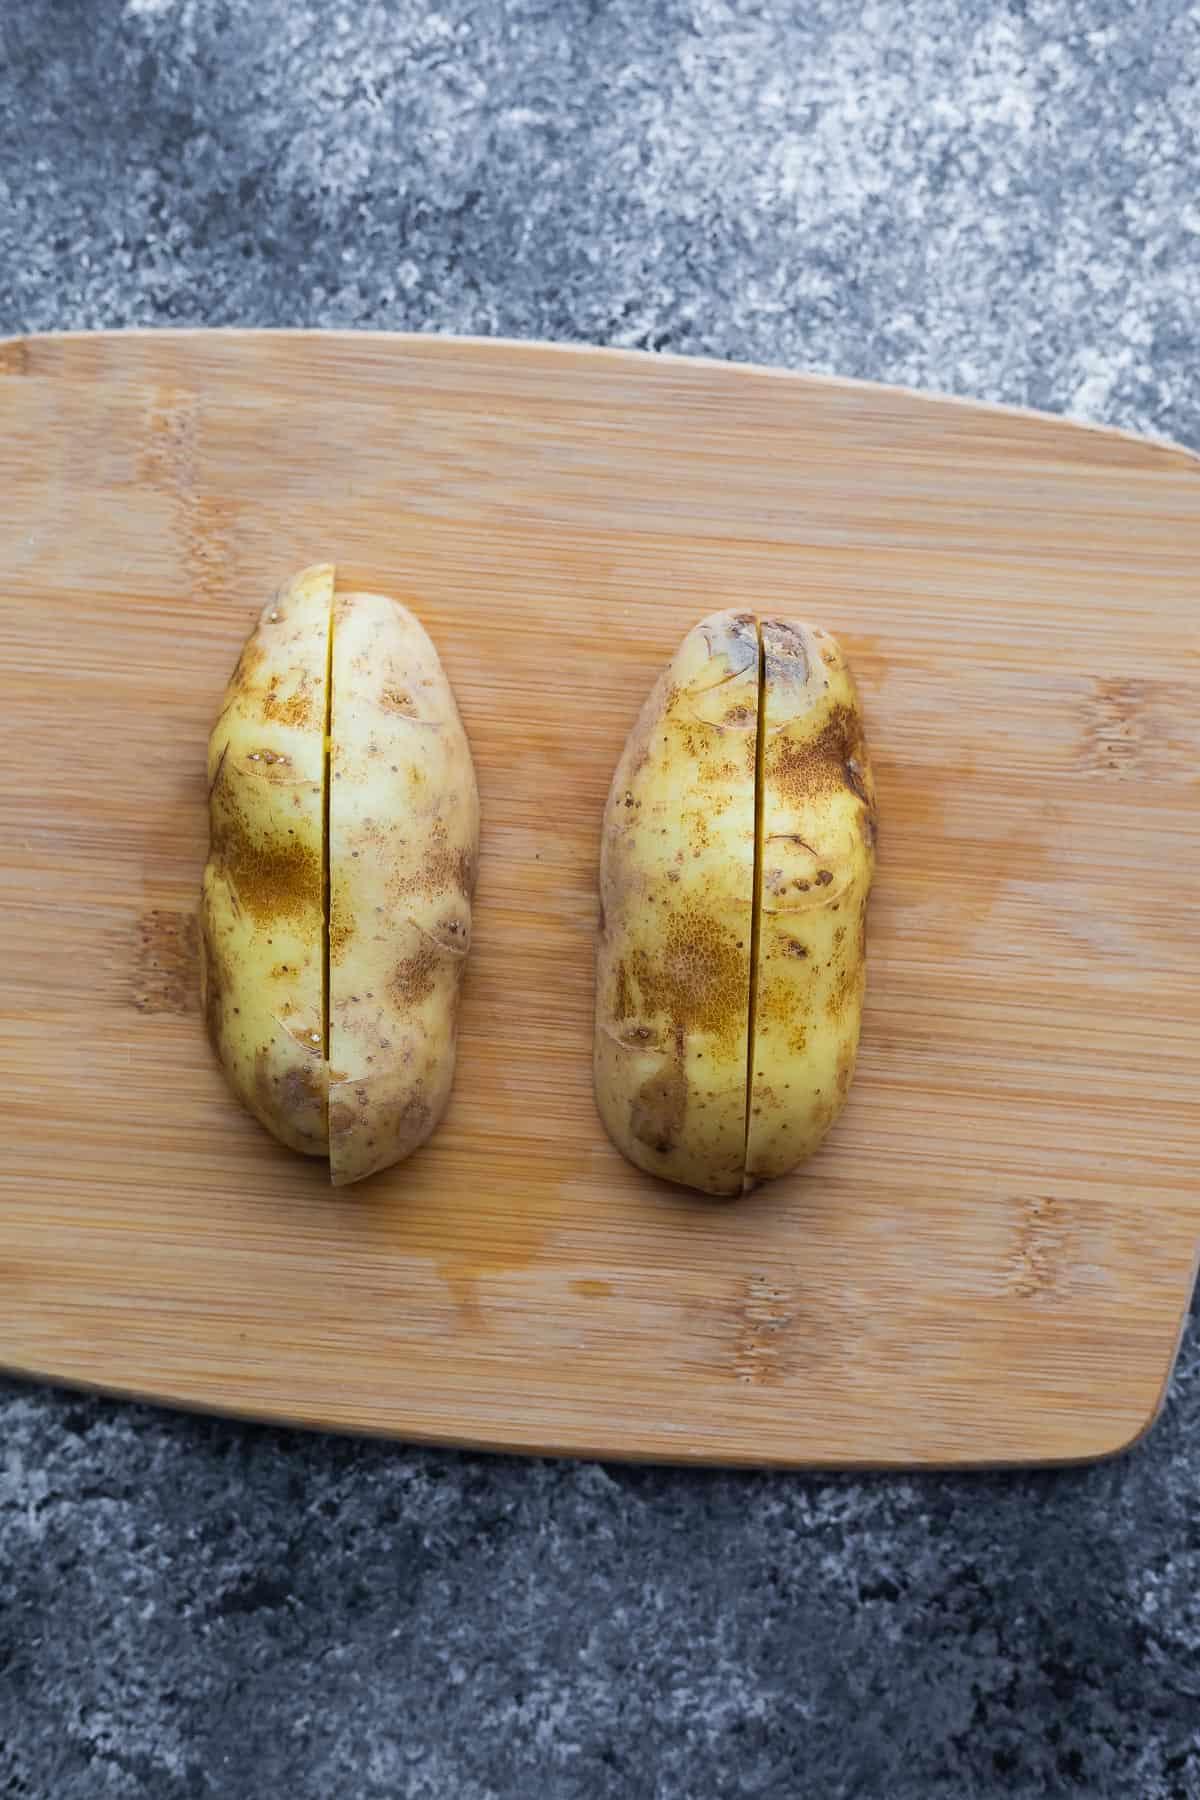 russet potato cut in quarters (cut side down) on cutting board